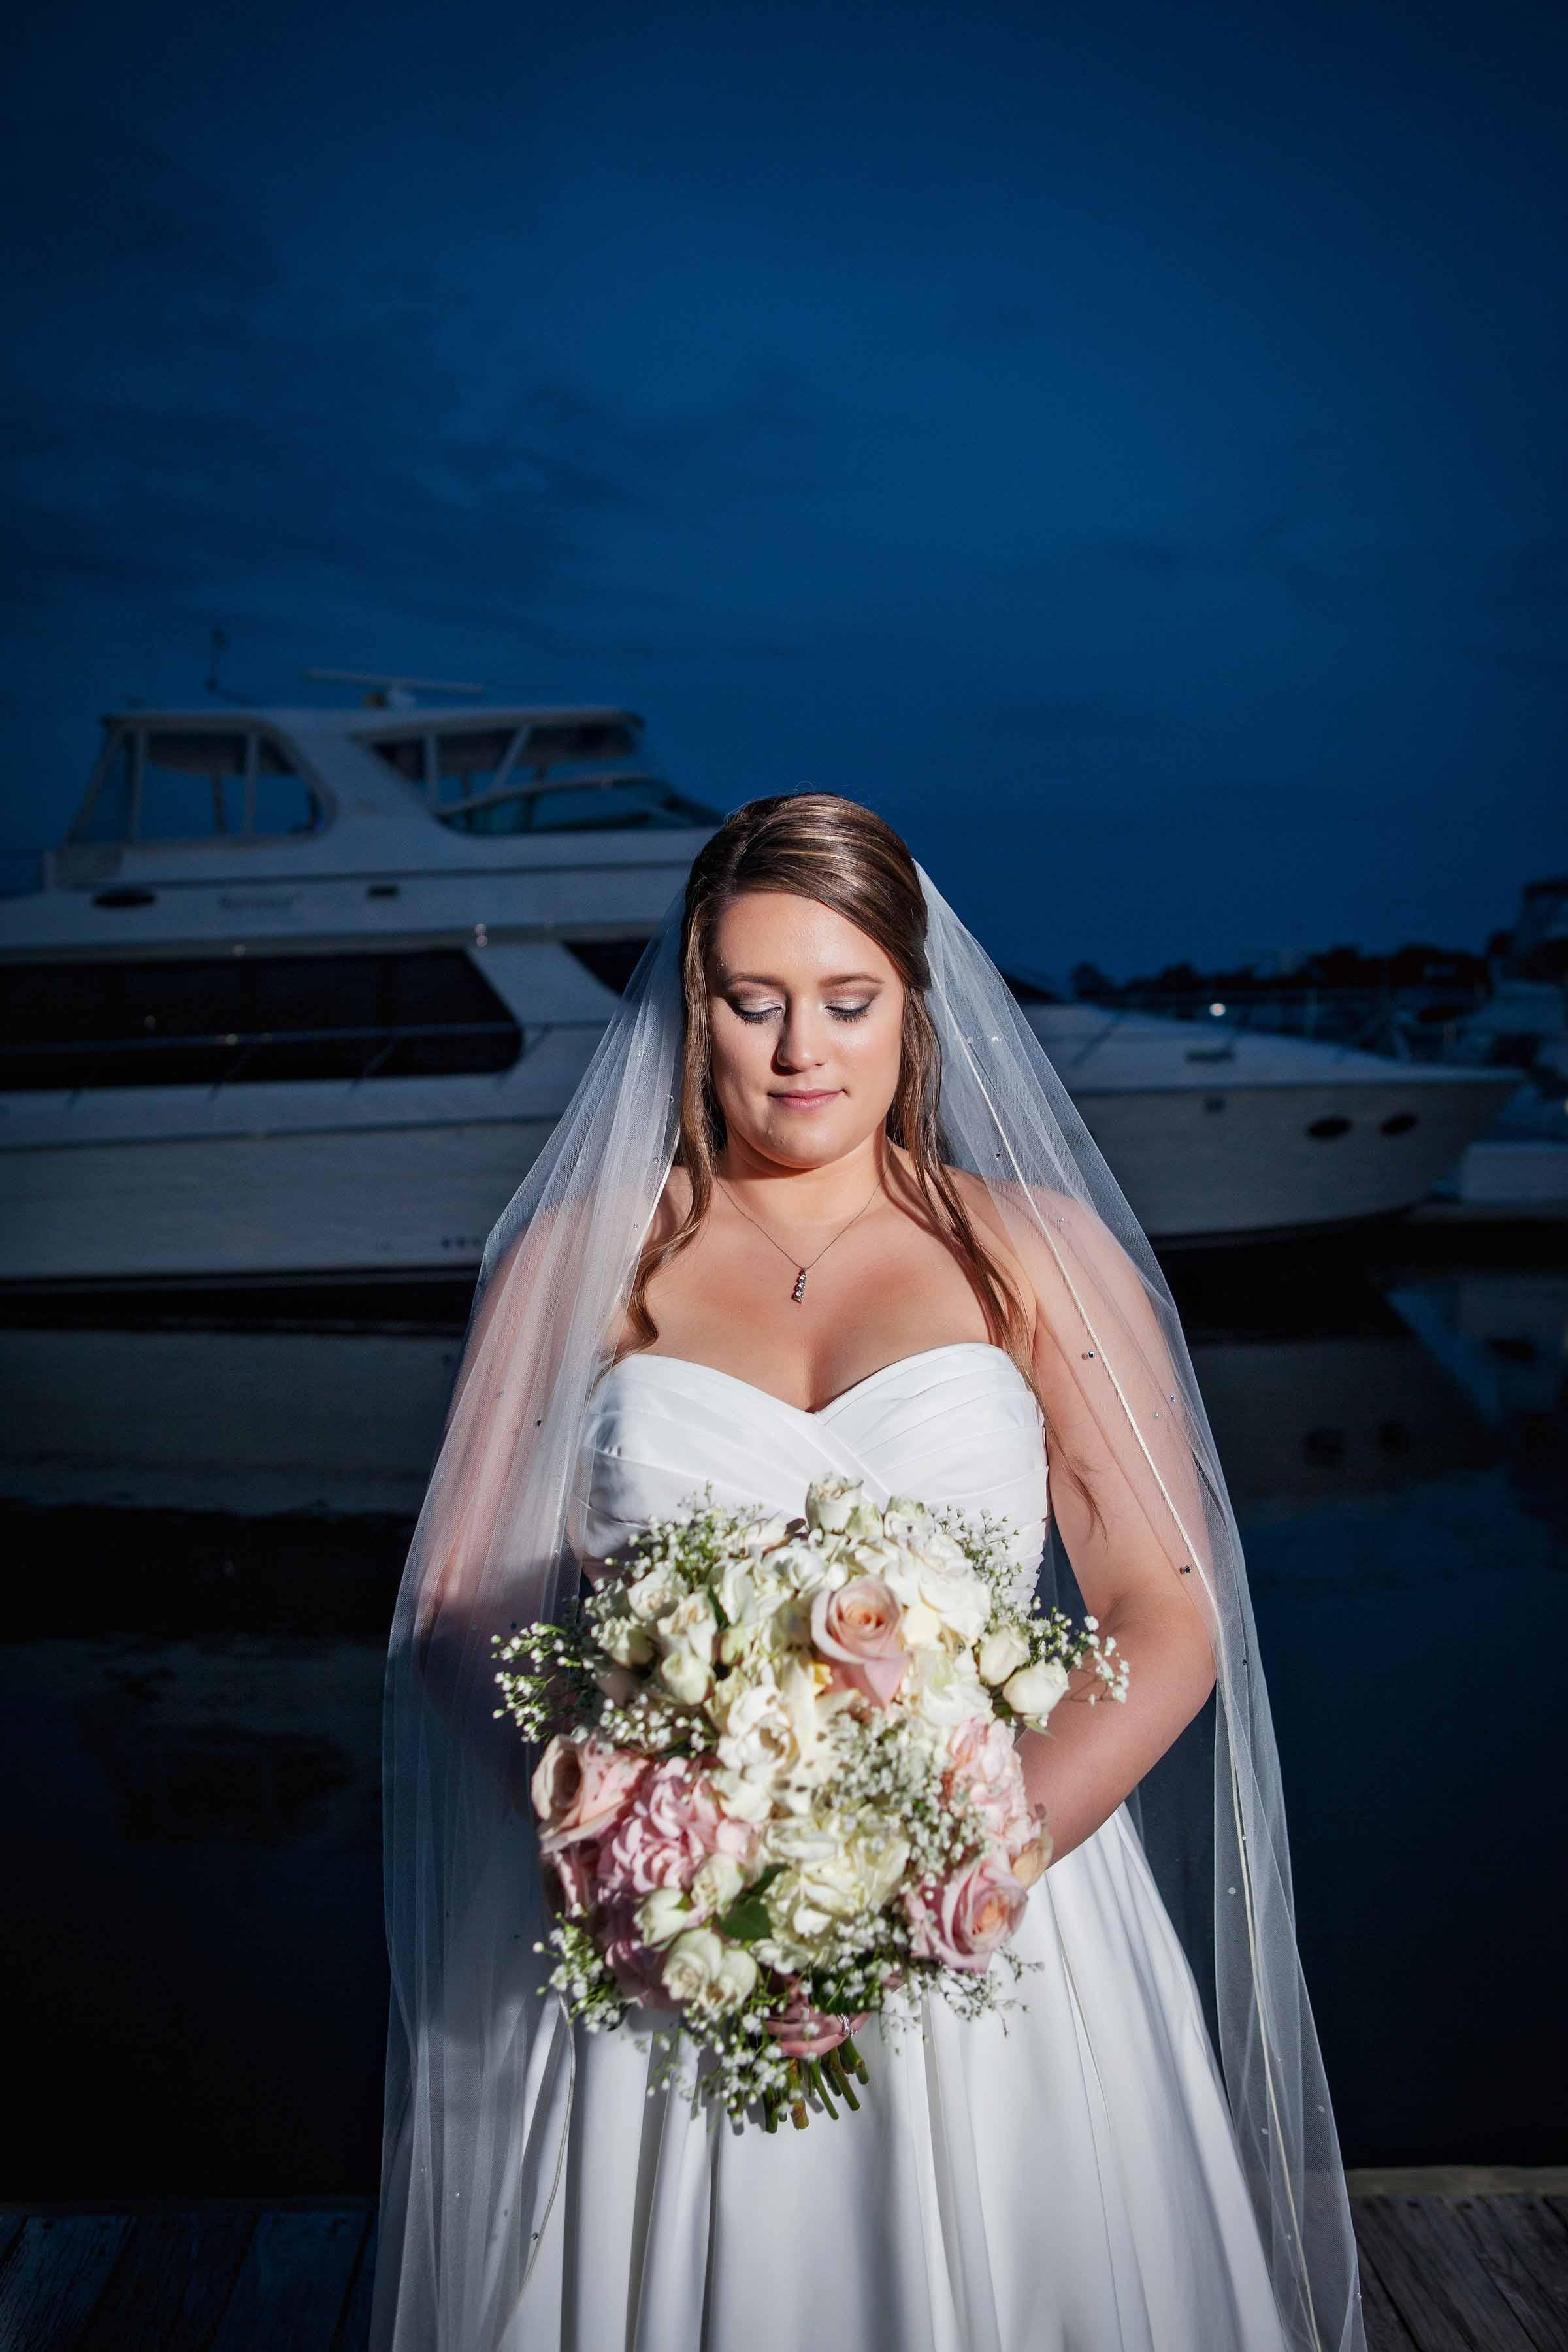 Marina Shores Wedding Photograph - Virginia Beach - Sarah And Matthew -by John Cachero for Ross Costanza Photography